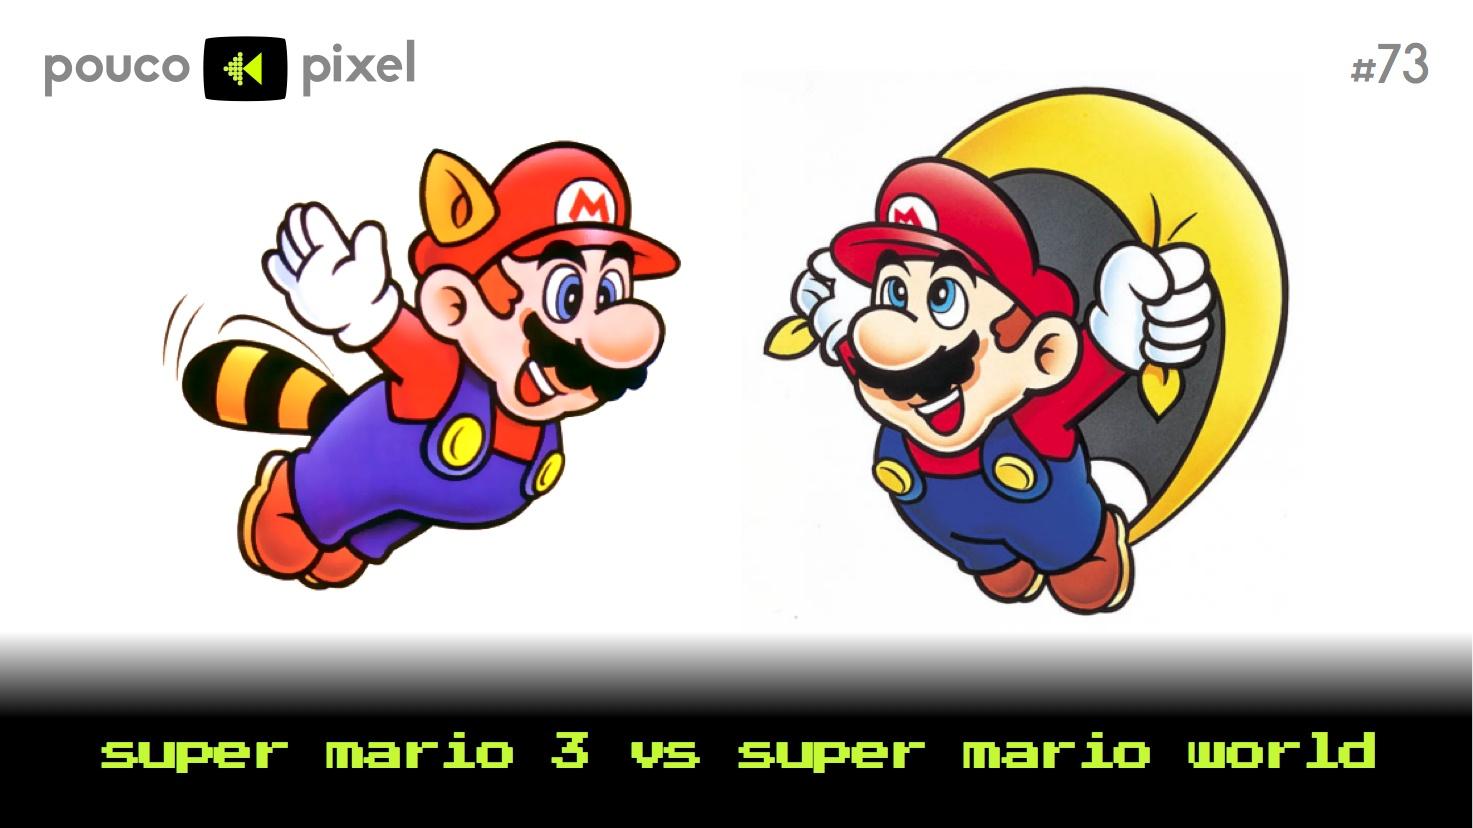 Capa - Super Mario 3 vs. Super Mario World